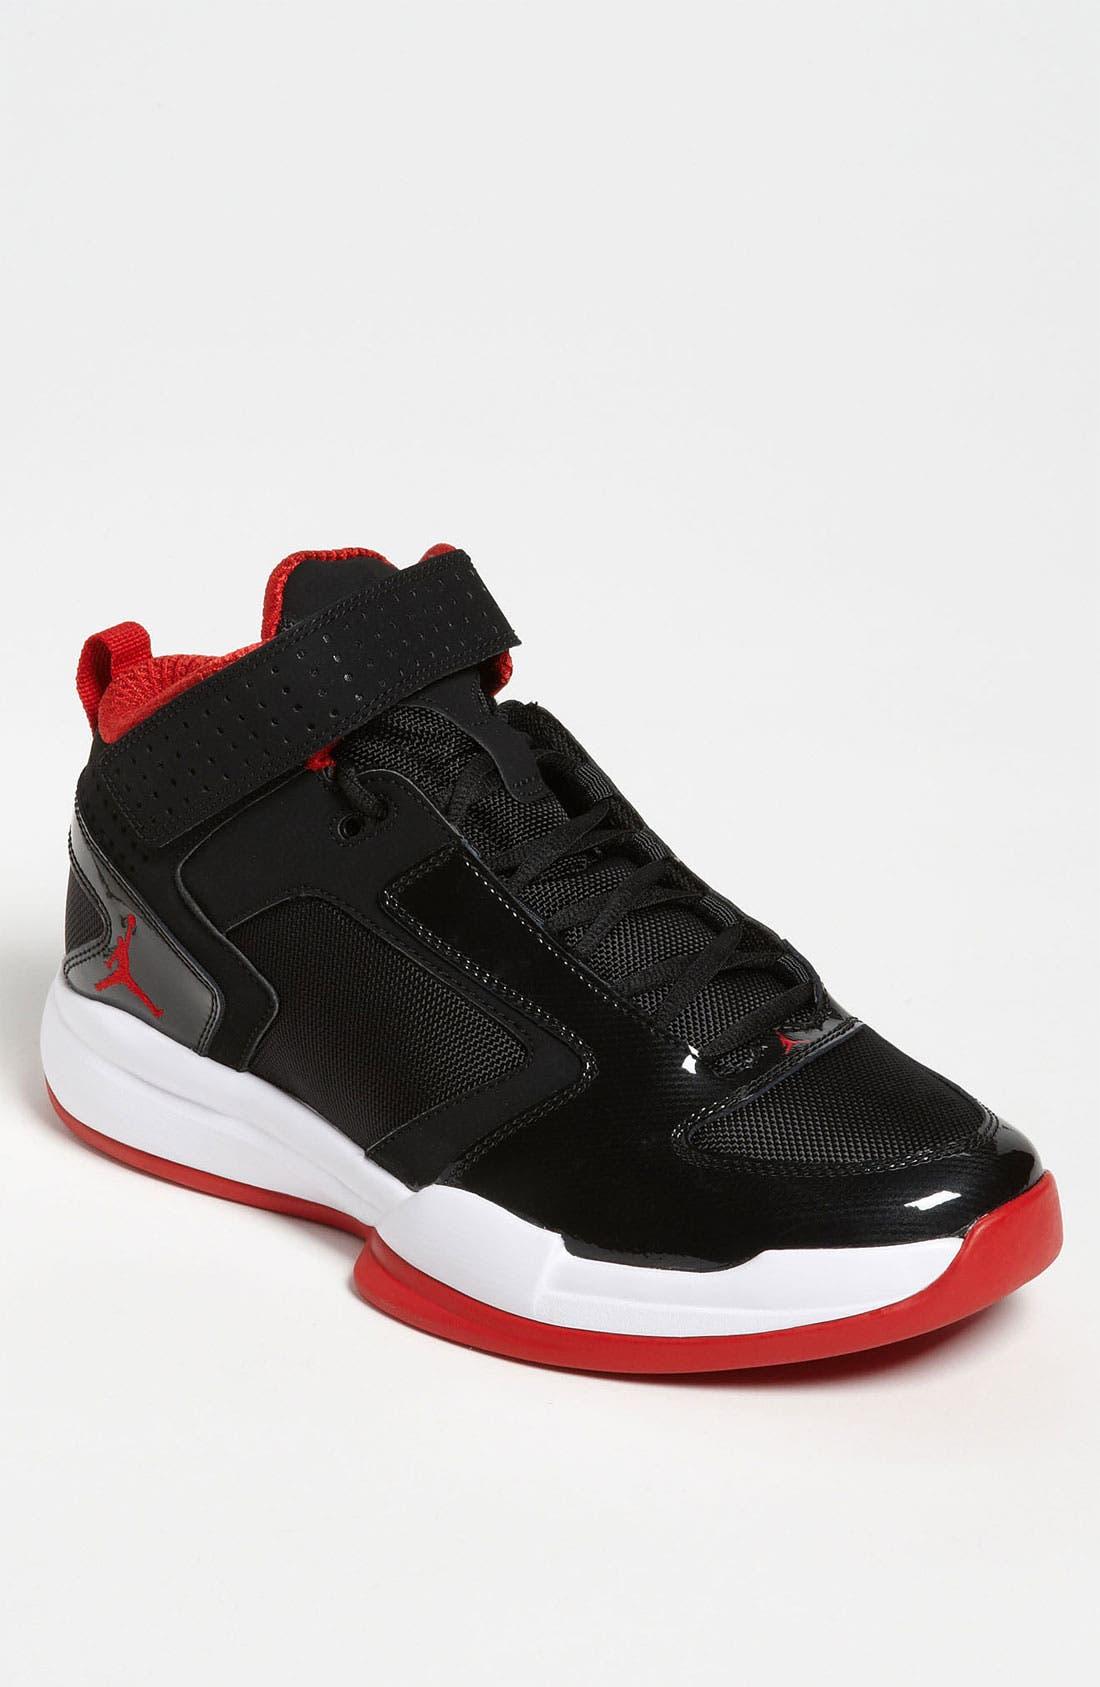 Alternate Image 1 Selected - Nike 'Jordan BCT Mid' Basketball Shoe (Men)